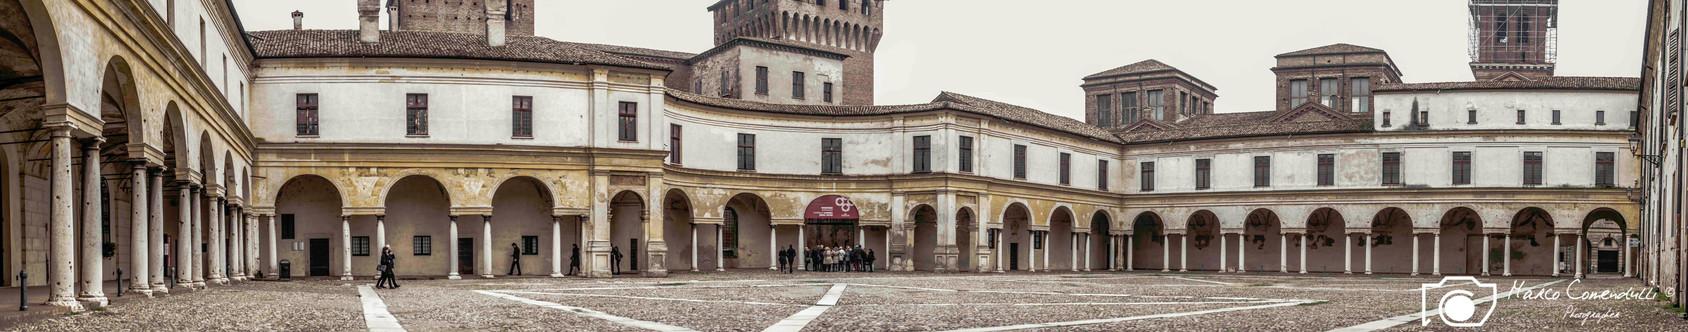 Mantova-22.jpg